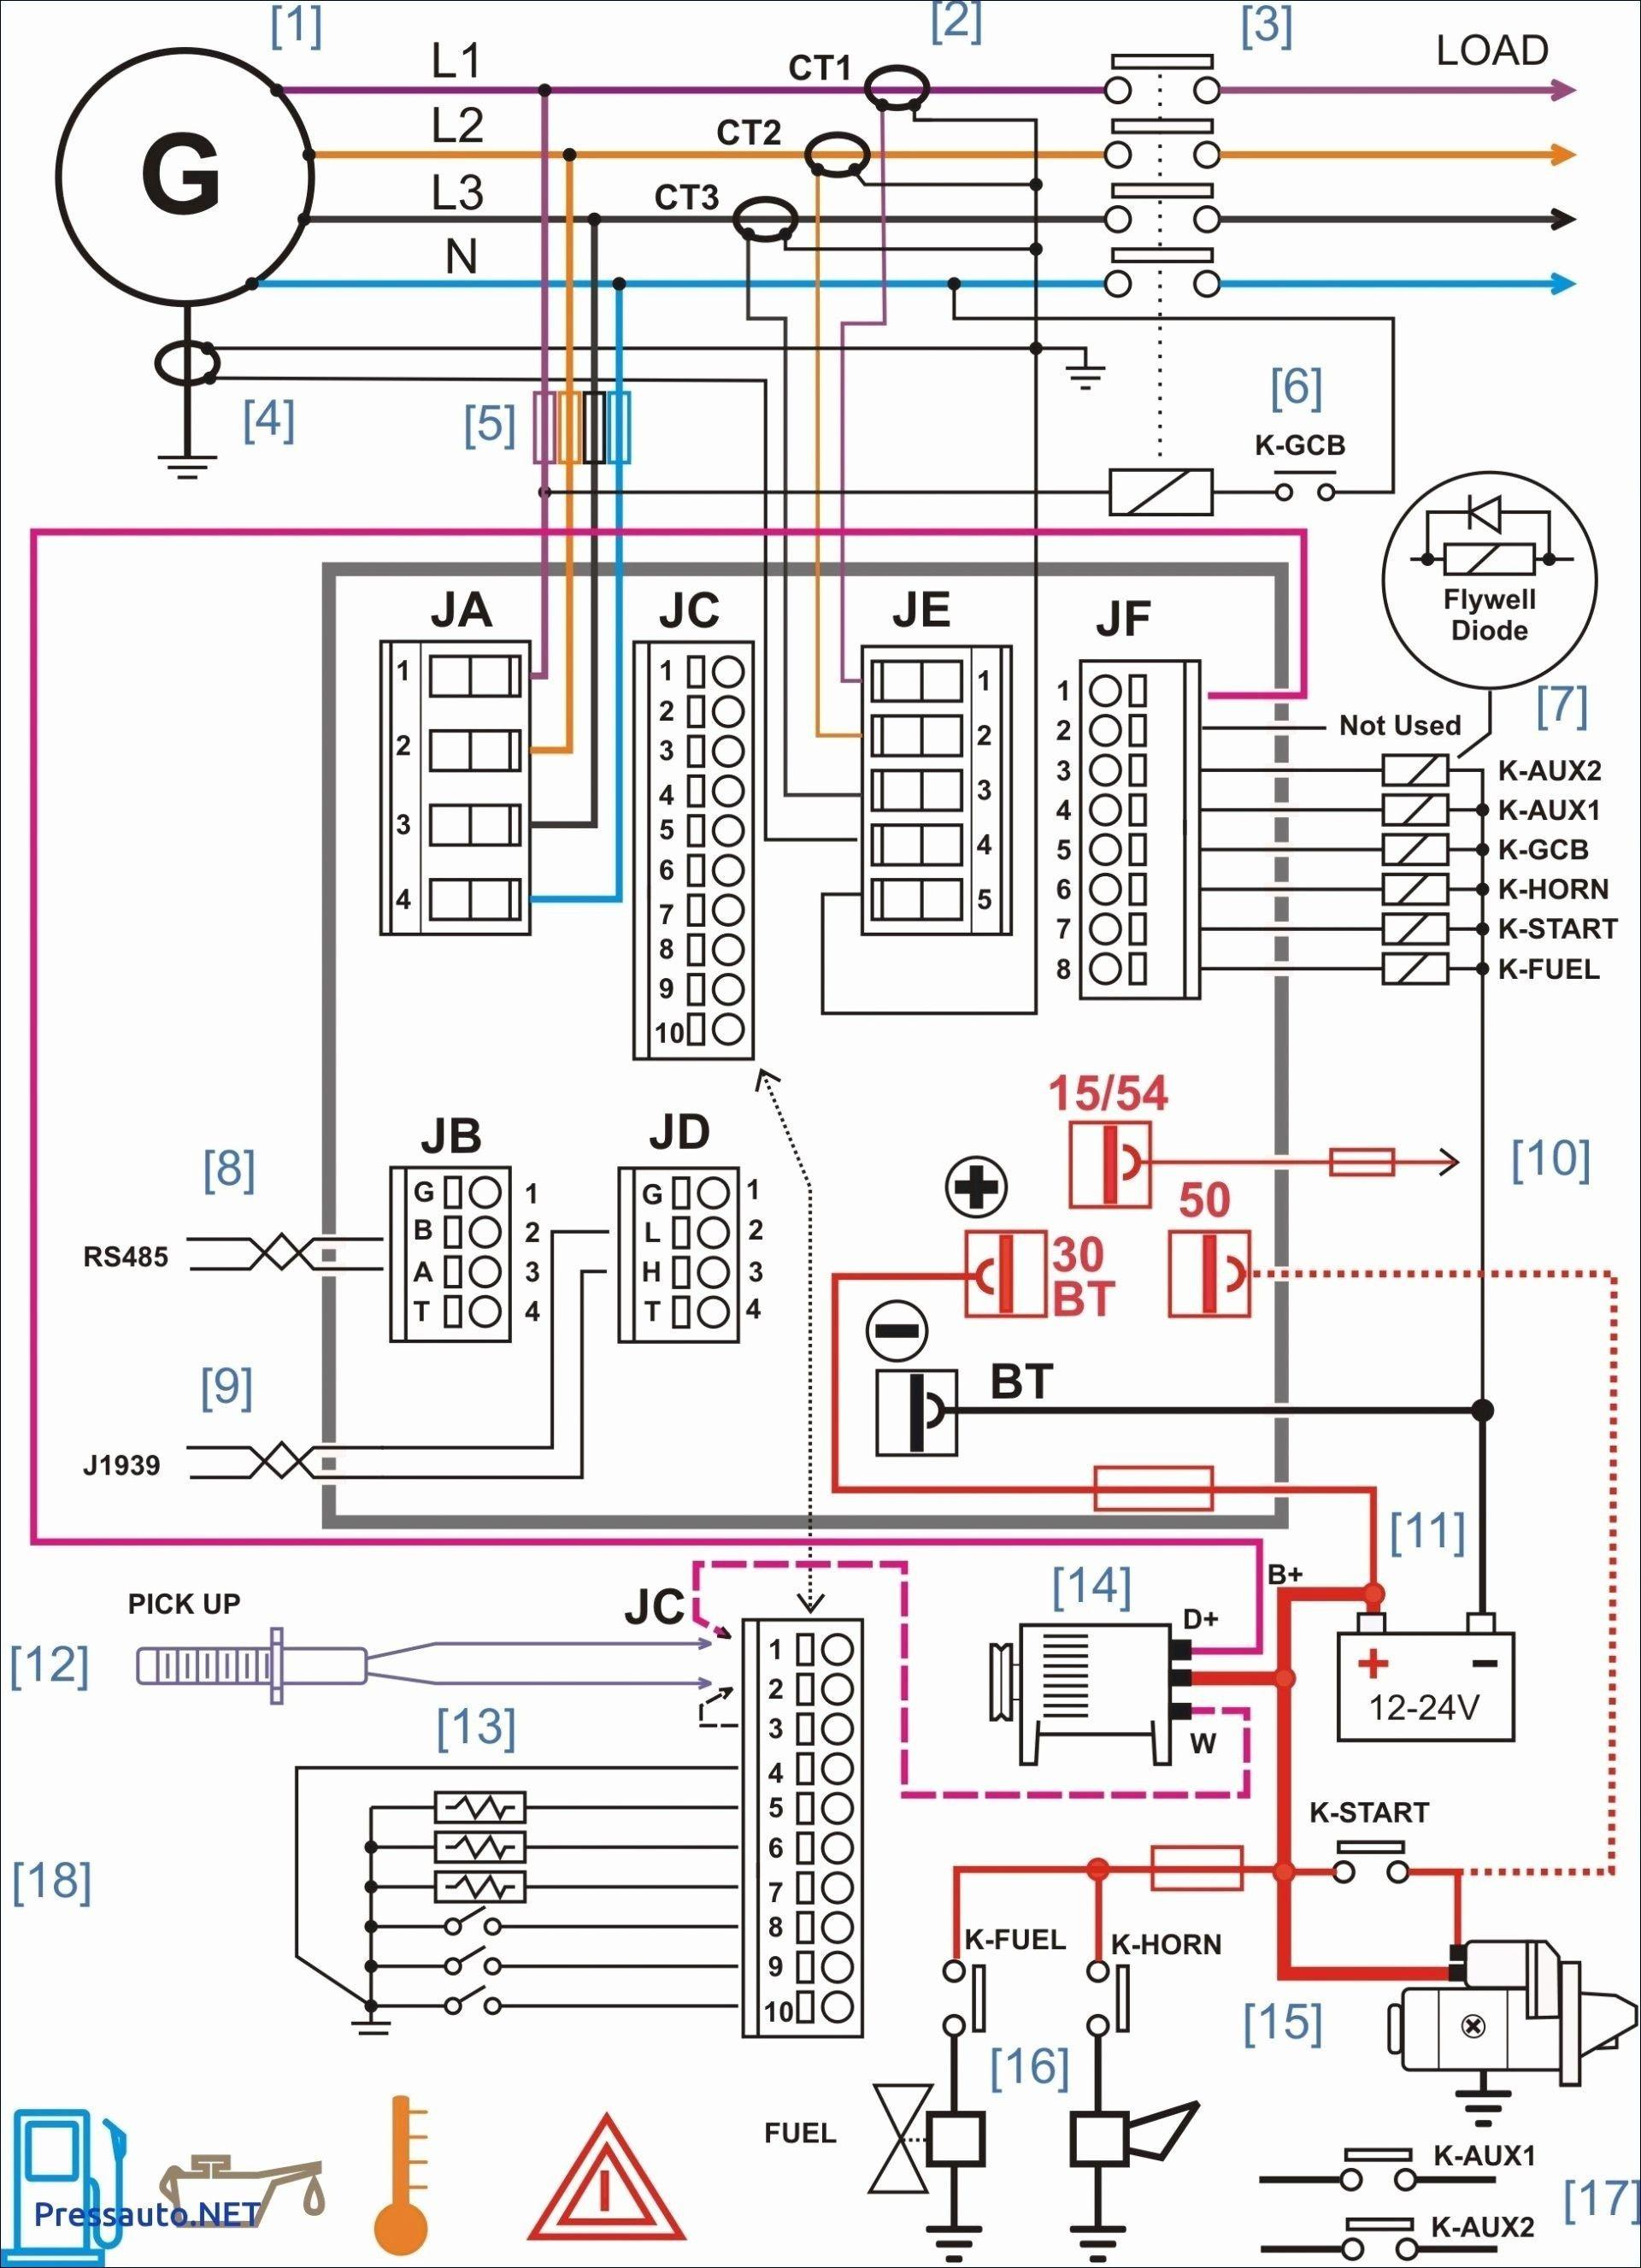 17 Good Electrical Circuit Diagram House Wiring Ideas Electrical Circuit Diagram Diagram Design Electrical Wiring Diagram